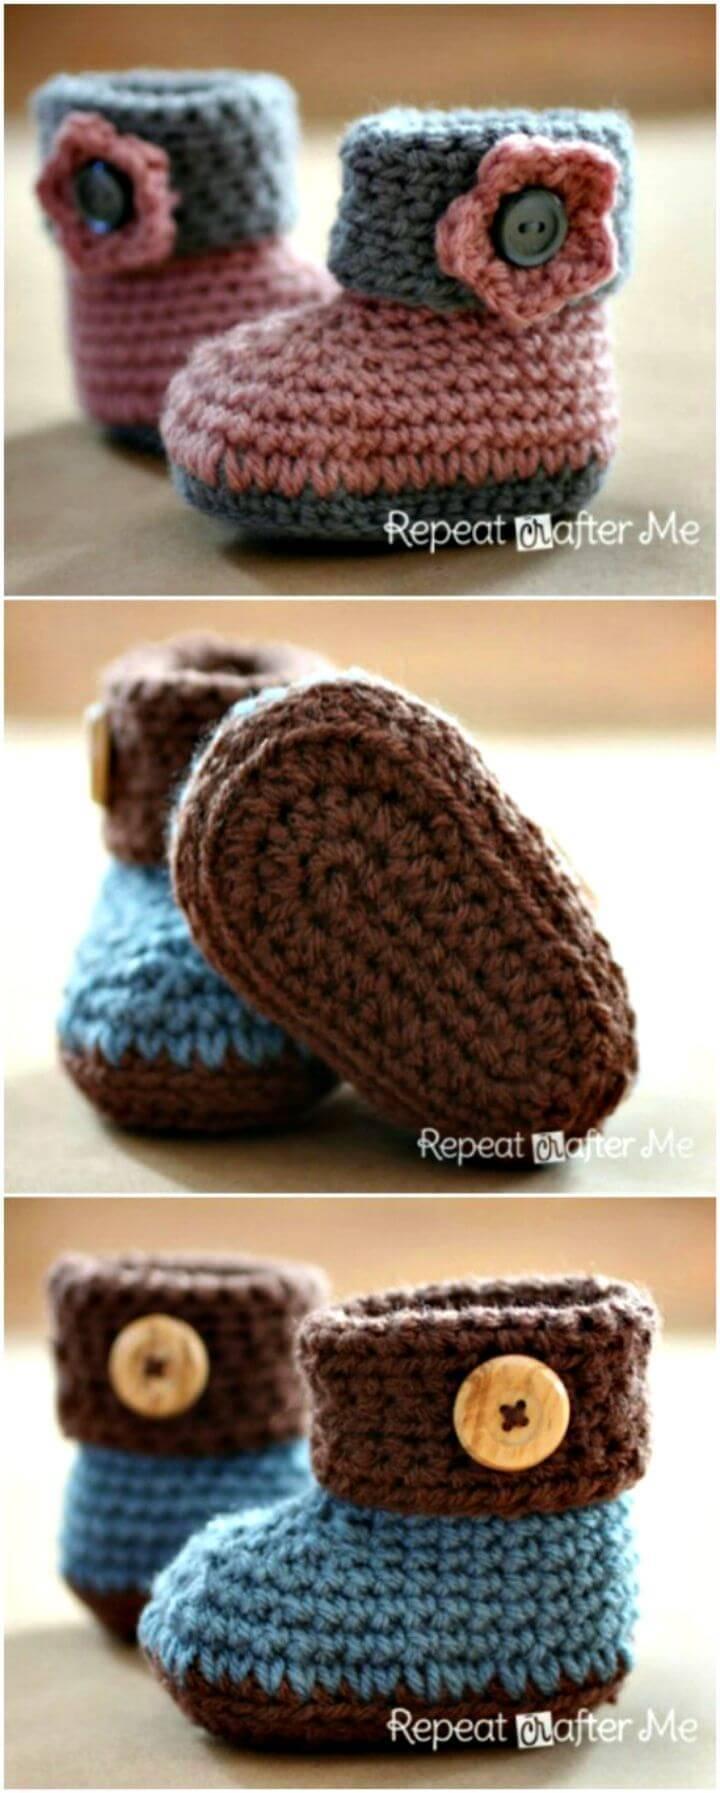 Free Crochet Cuffed Baby Booties Pattern